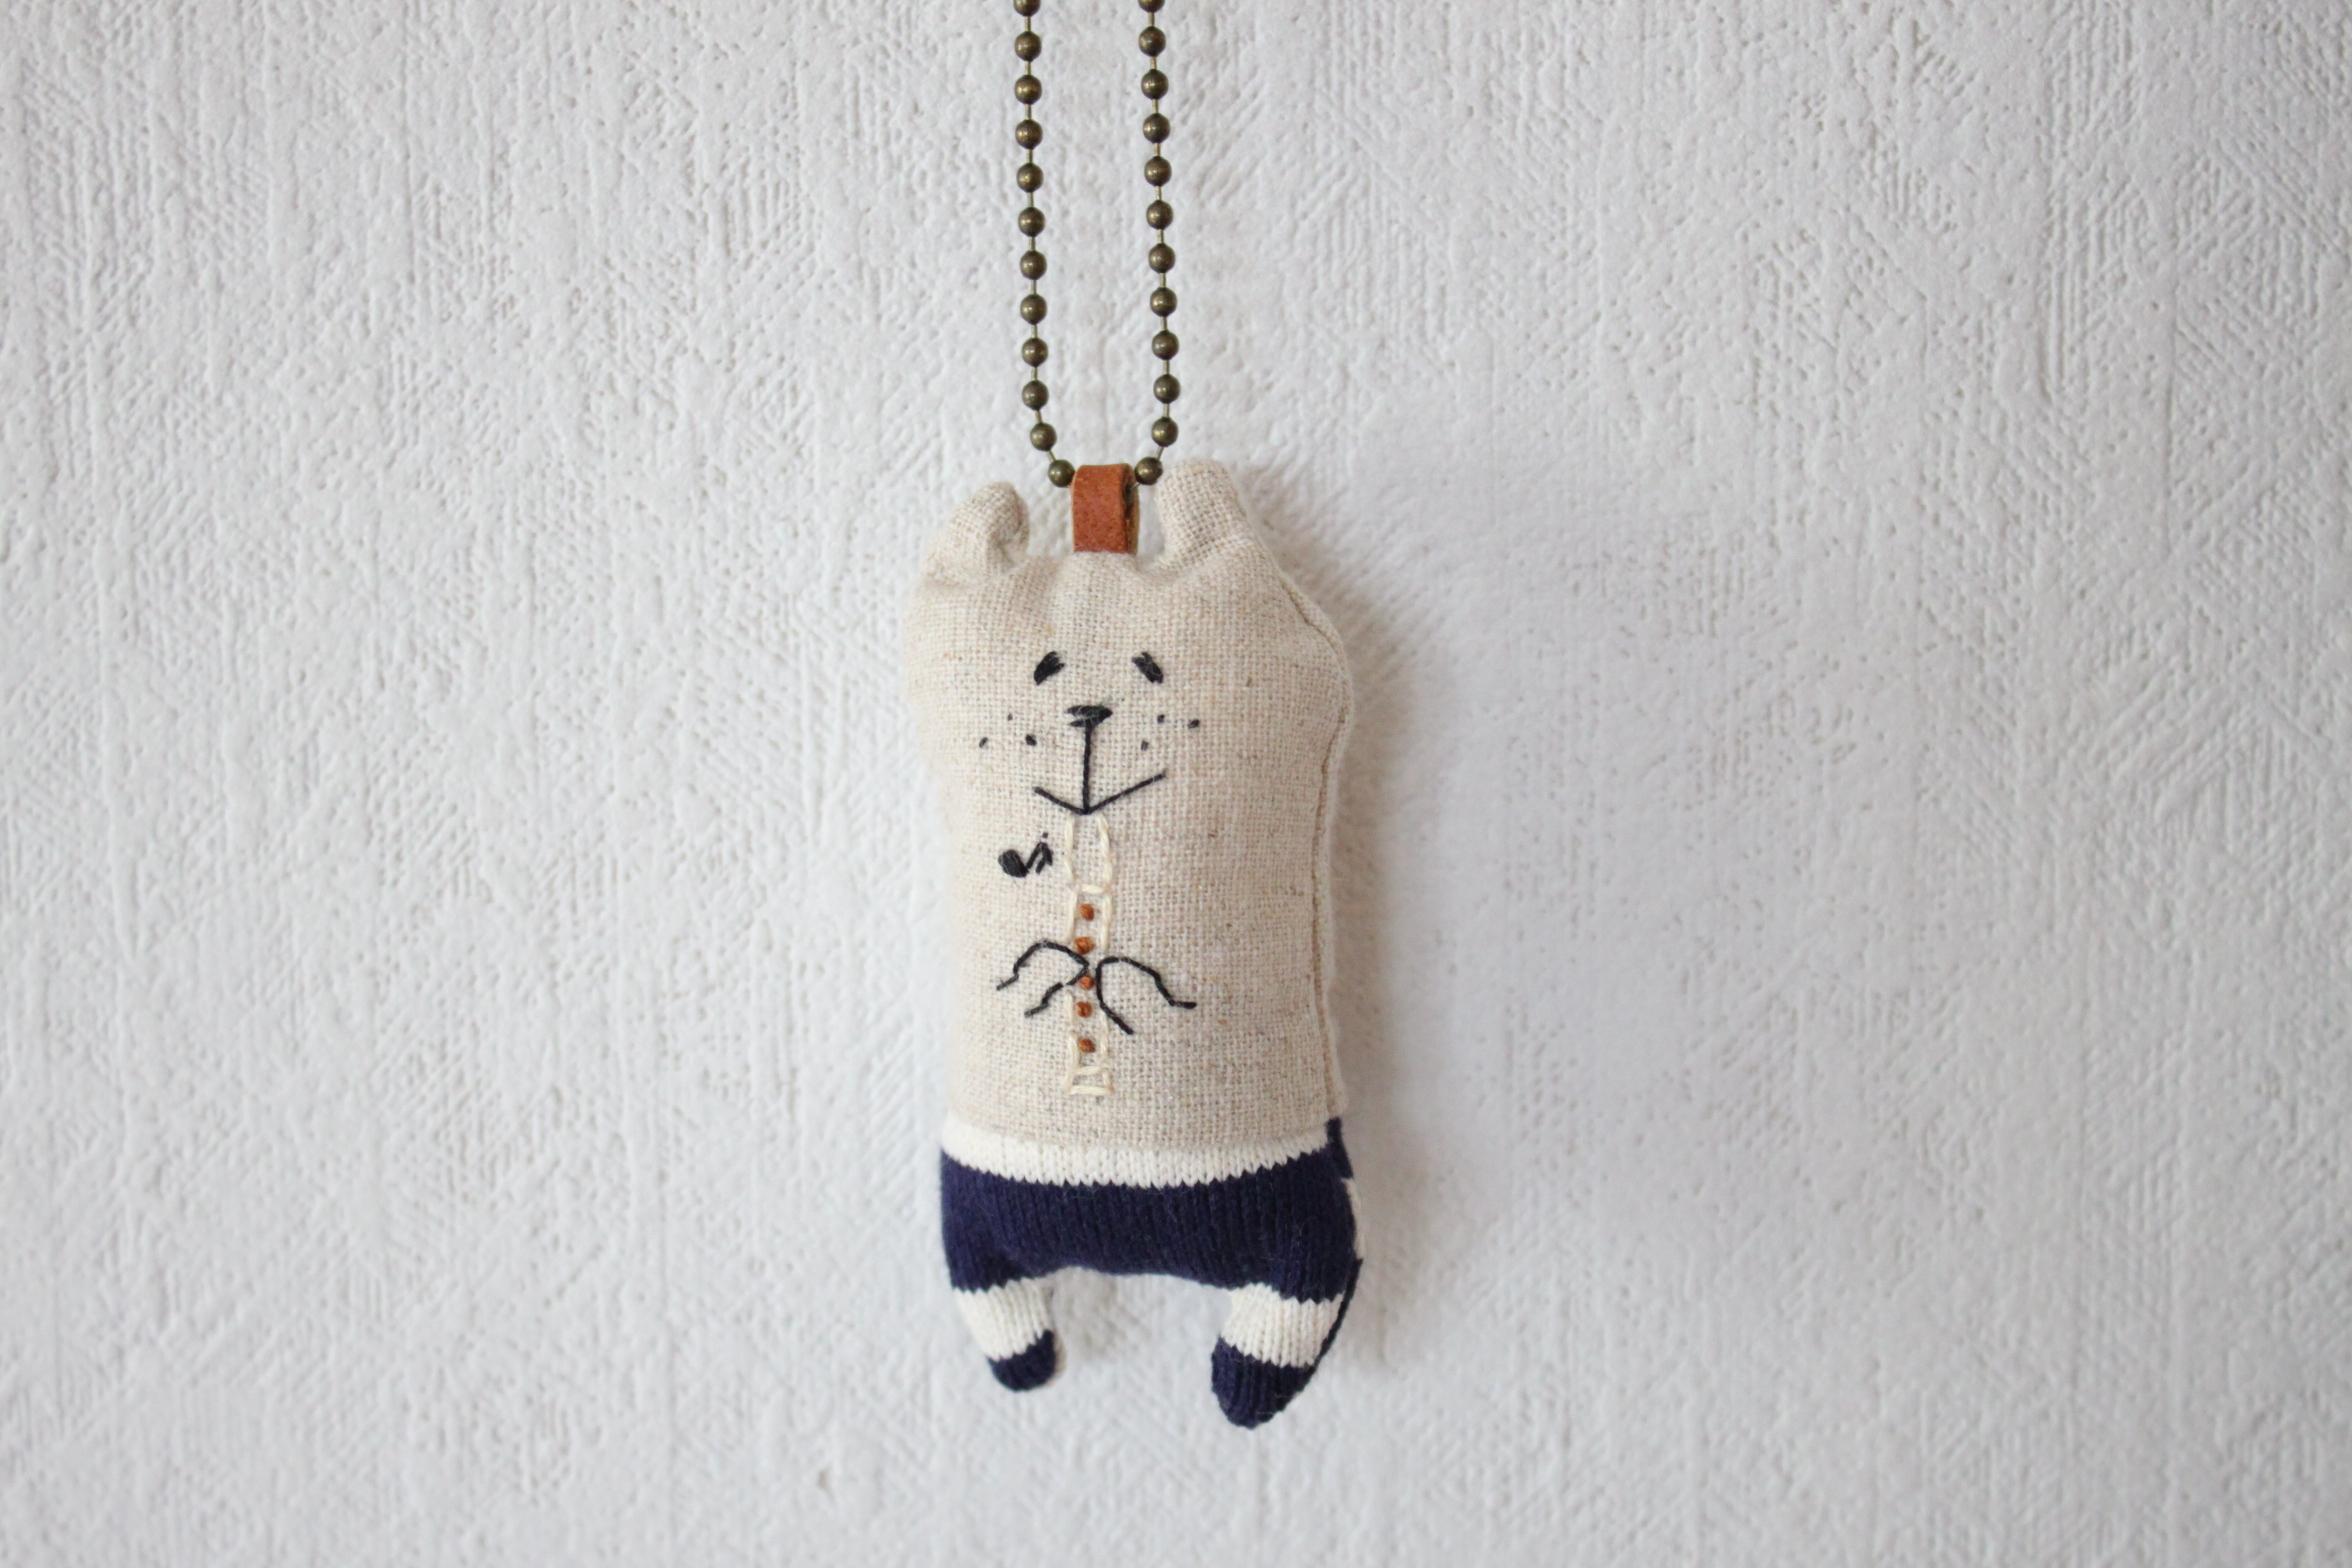 muuちゃん 手刺繍 リコーダー ストラップ